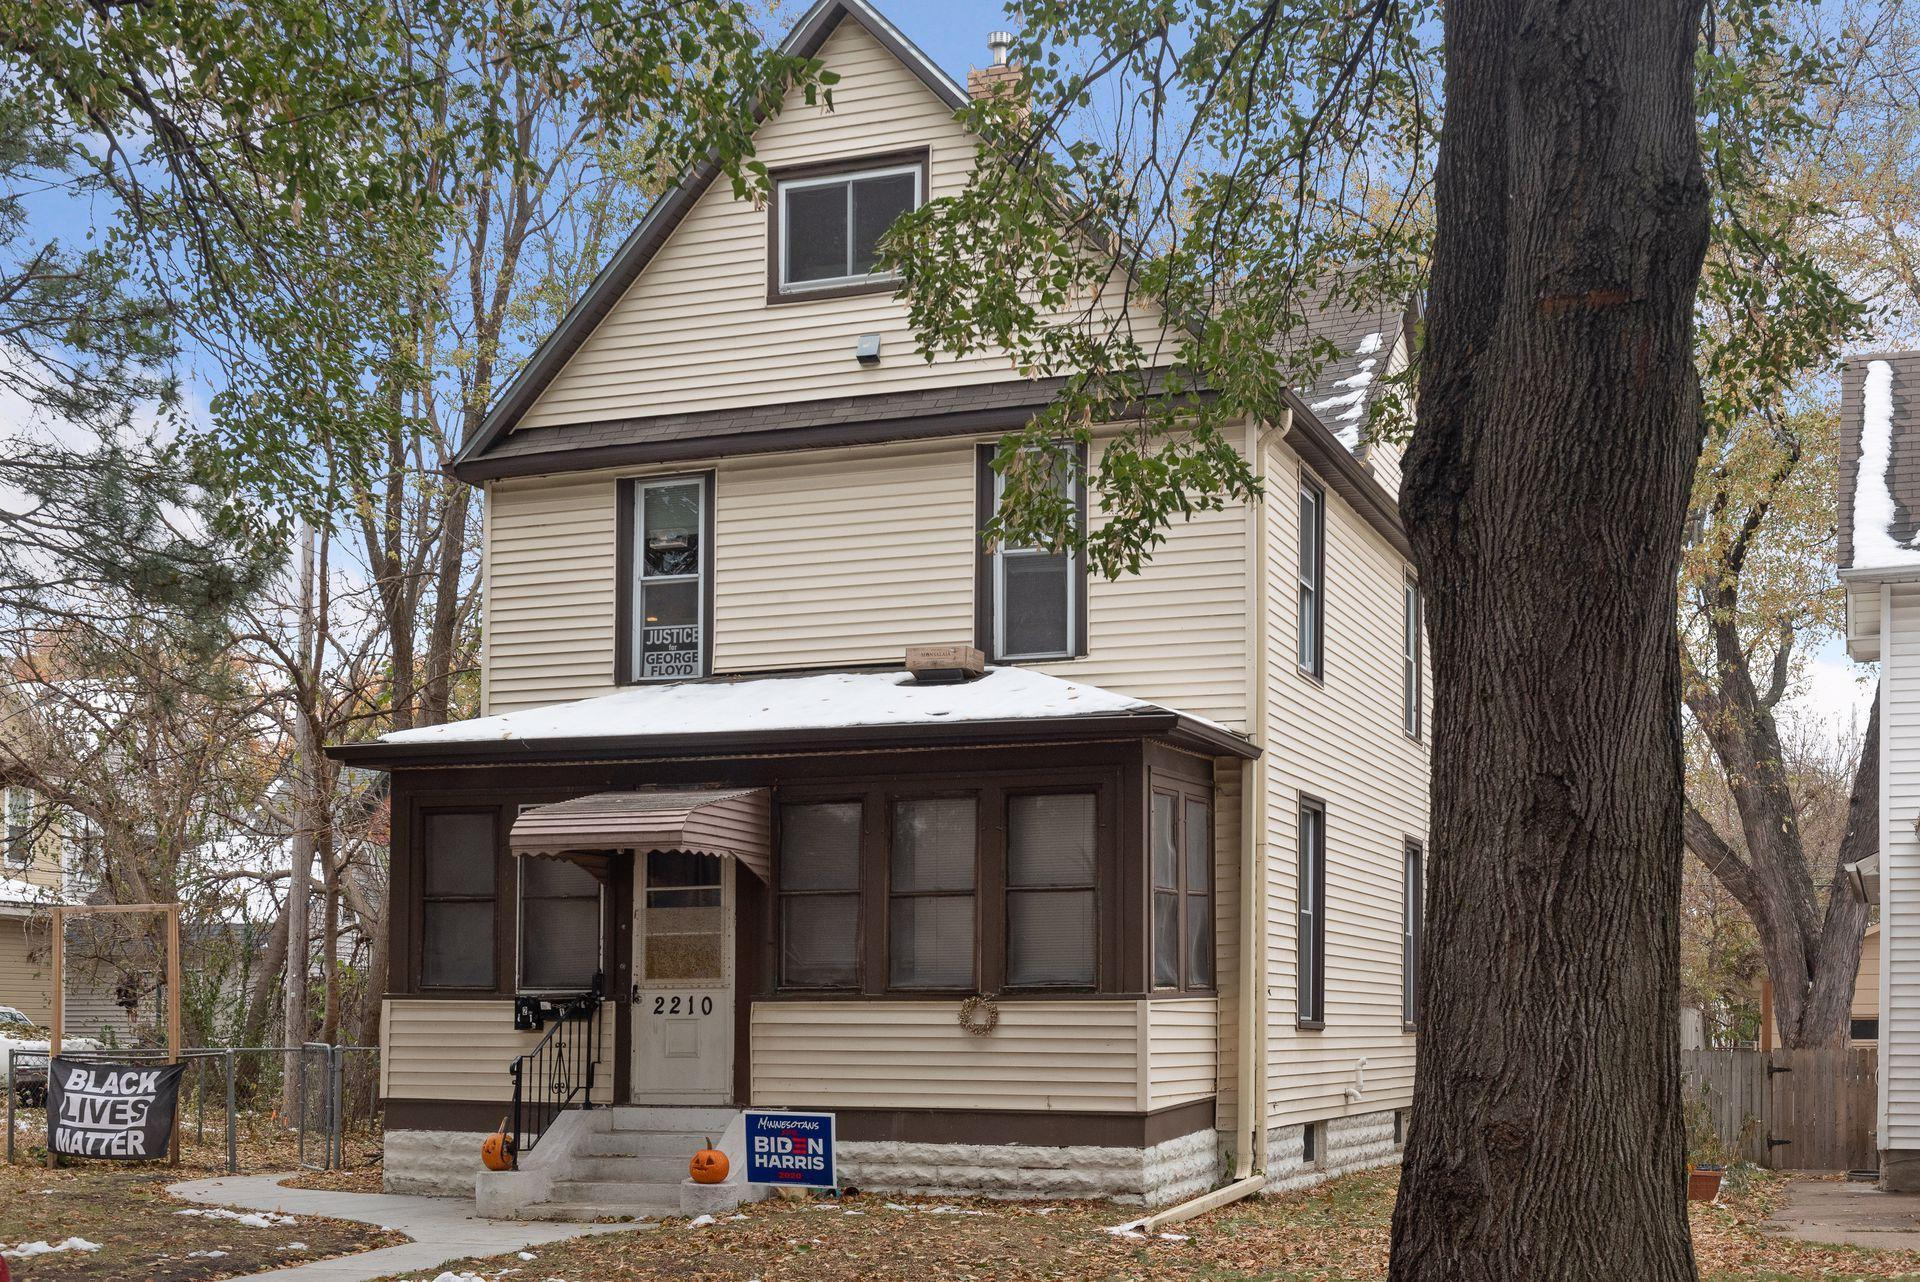 2210 3rd Street NE Property Photo - Minneapolis, MN real estate listing